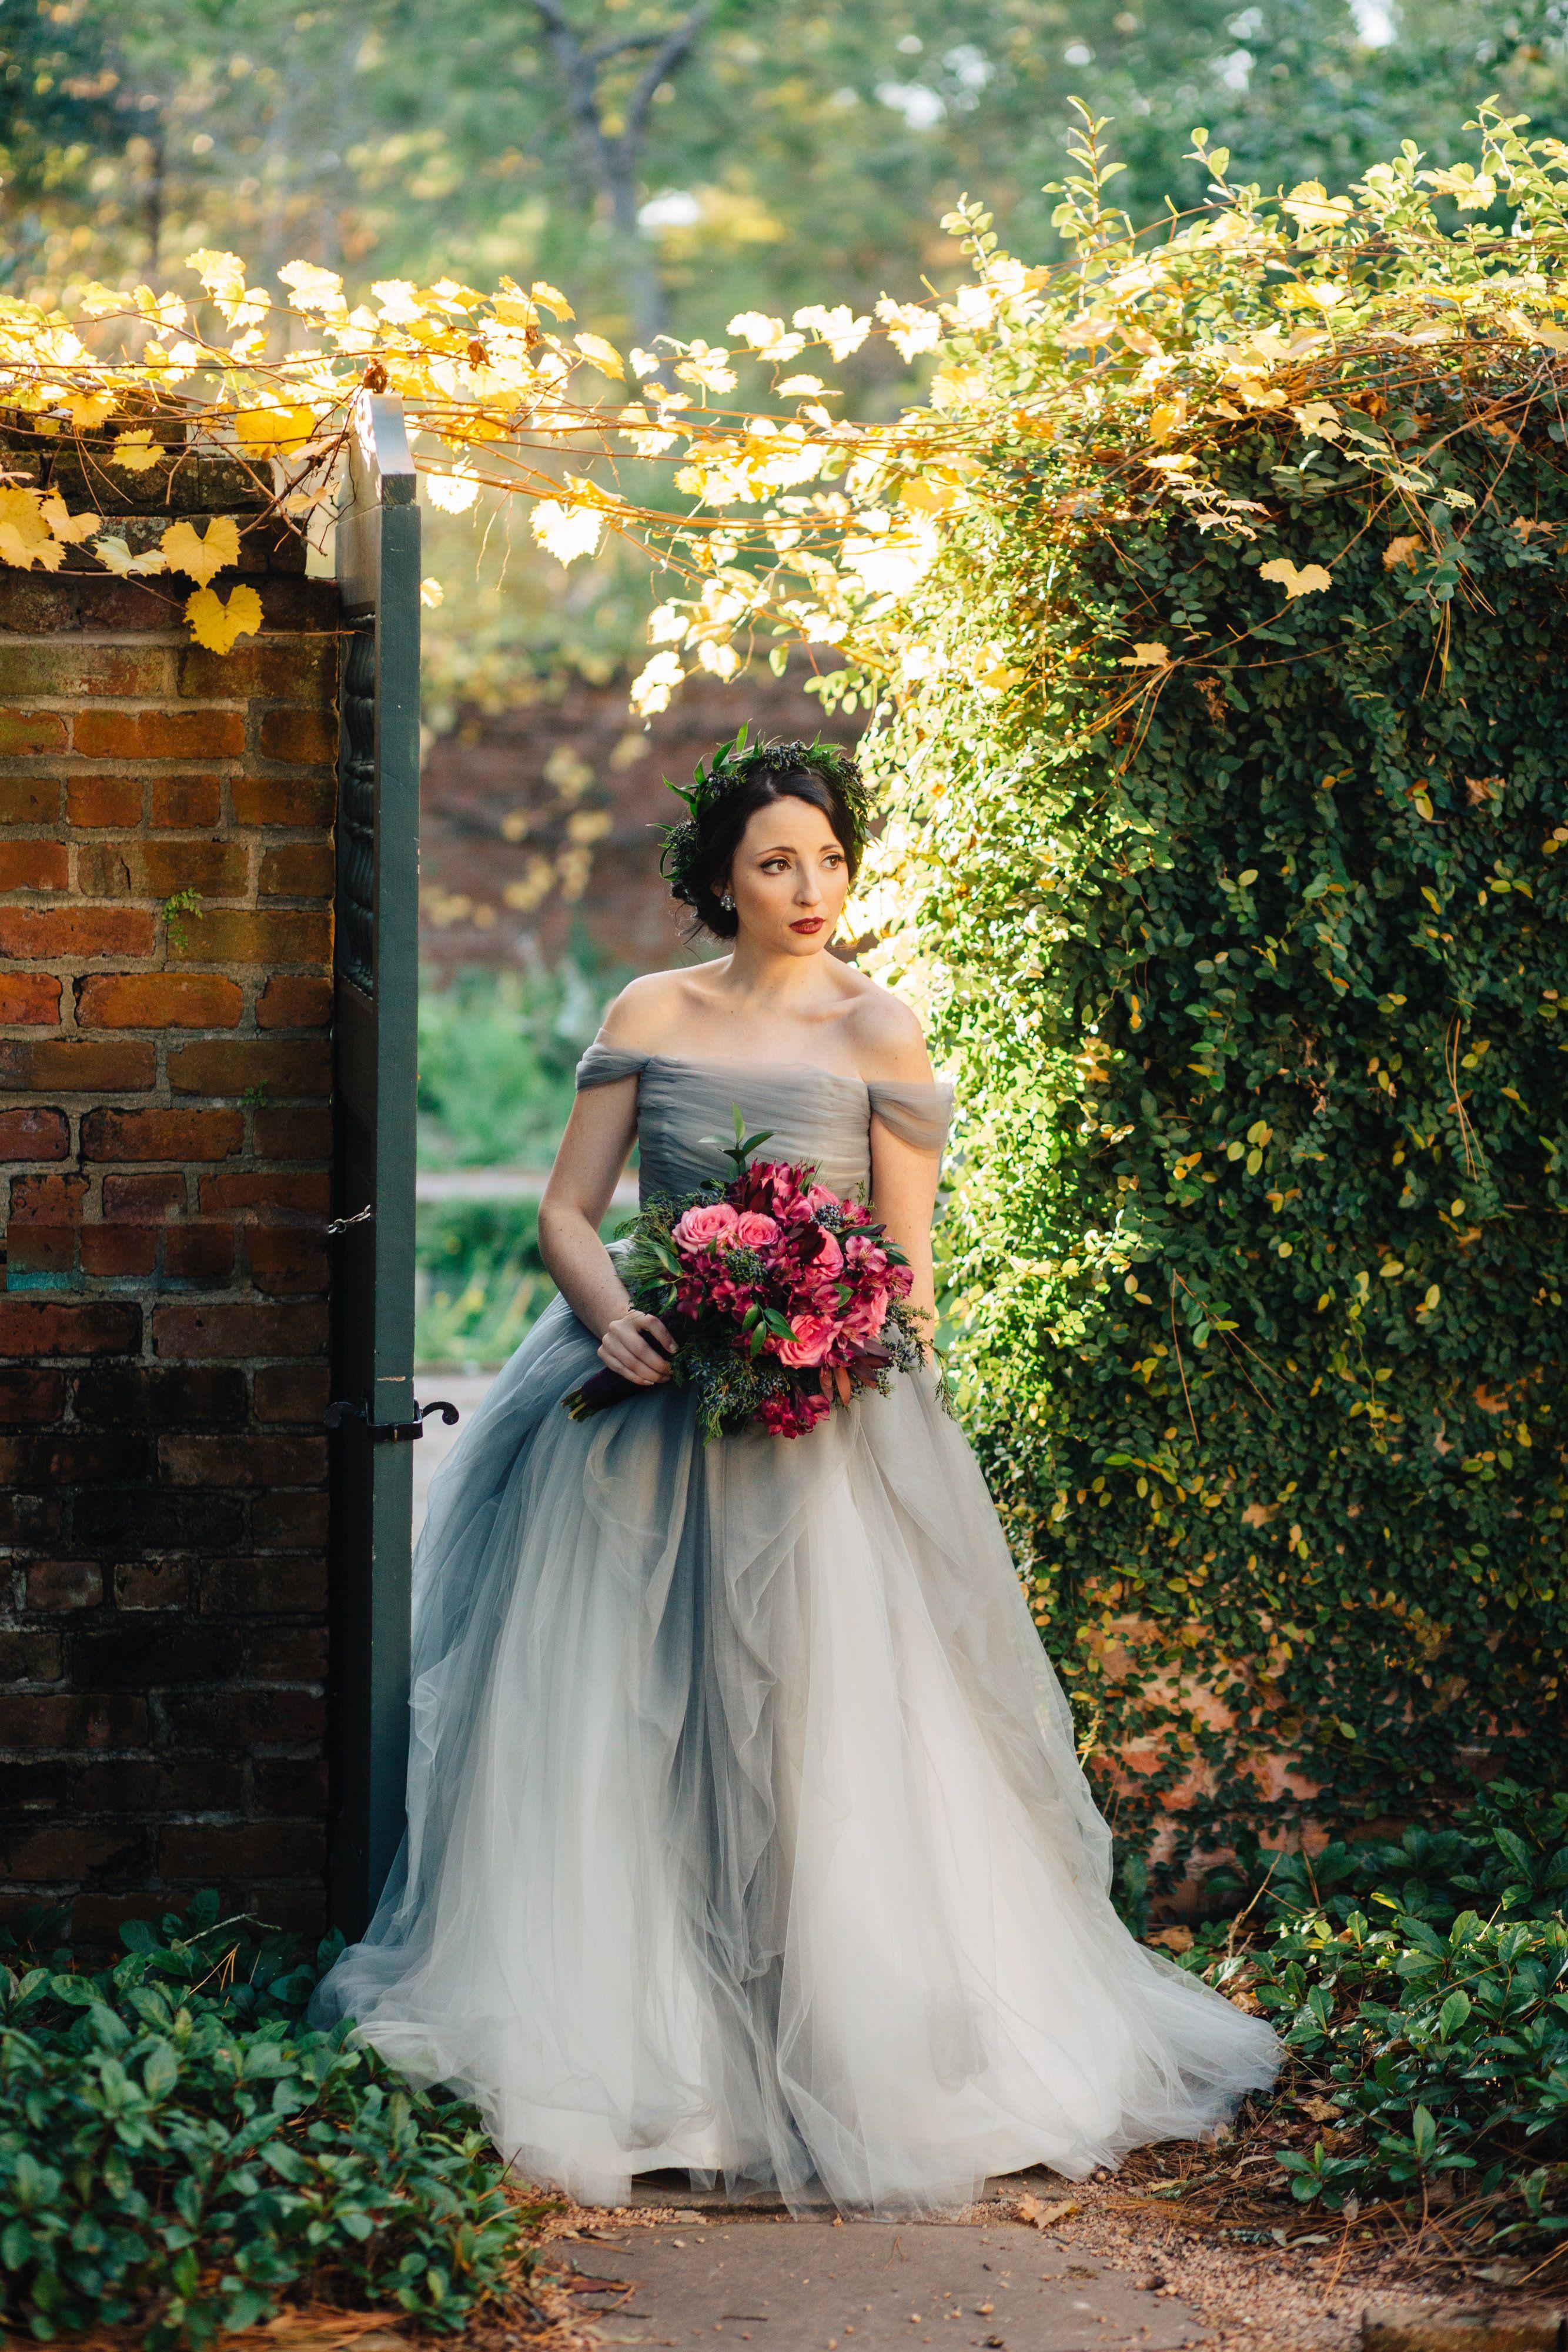 Sareh nouri marie antoinette real bride new orleans bride